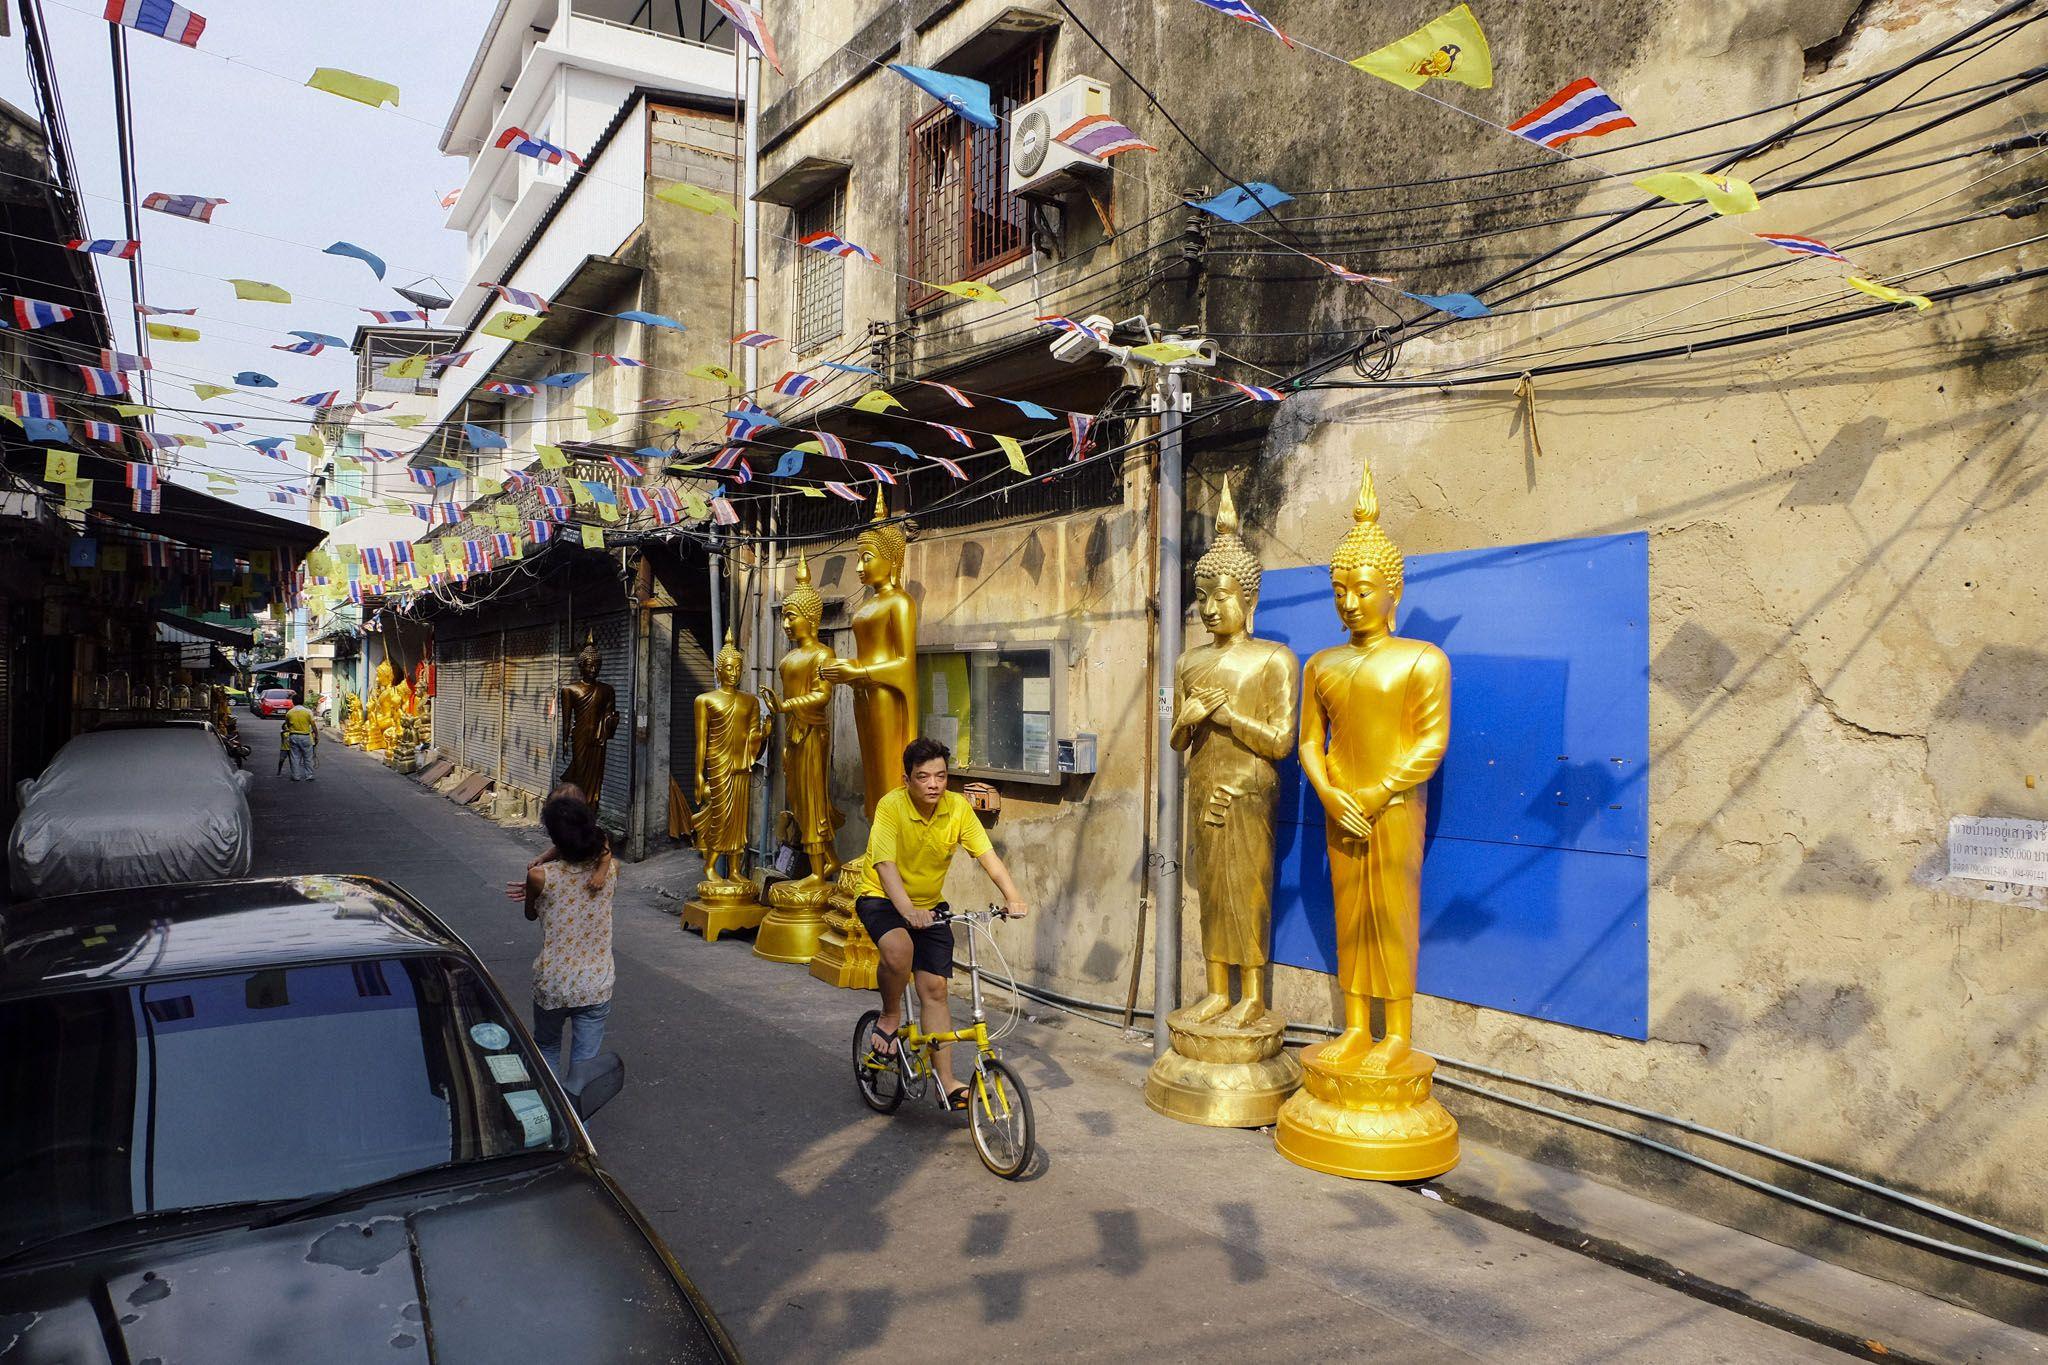 Bangkok's historic Phra Nakhon district still contains